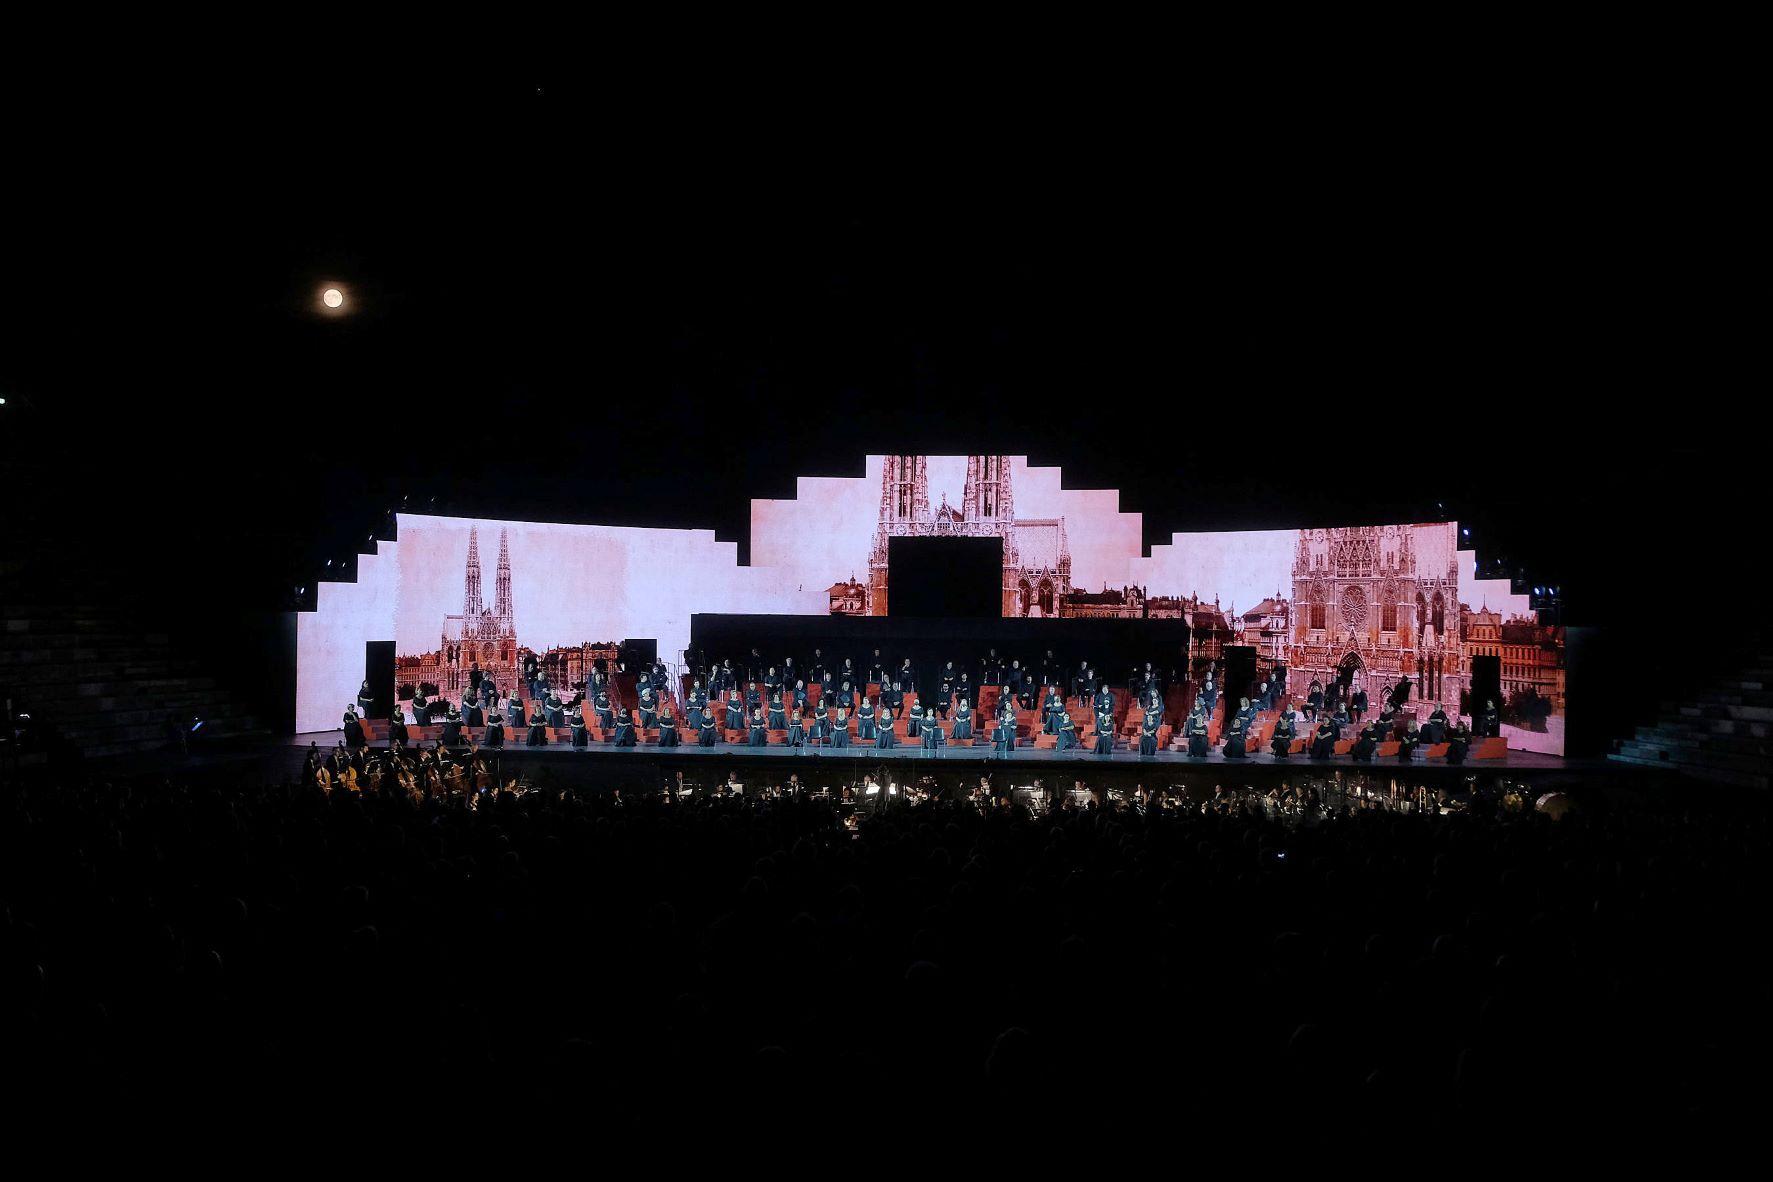 arena-di-verona-beethoven-2021